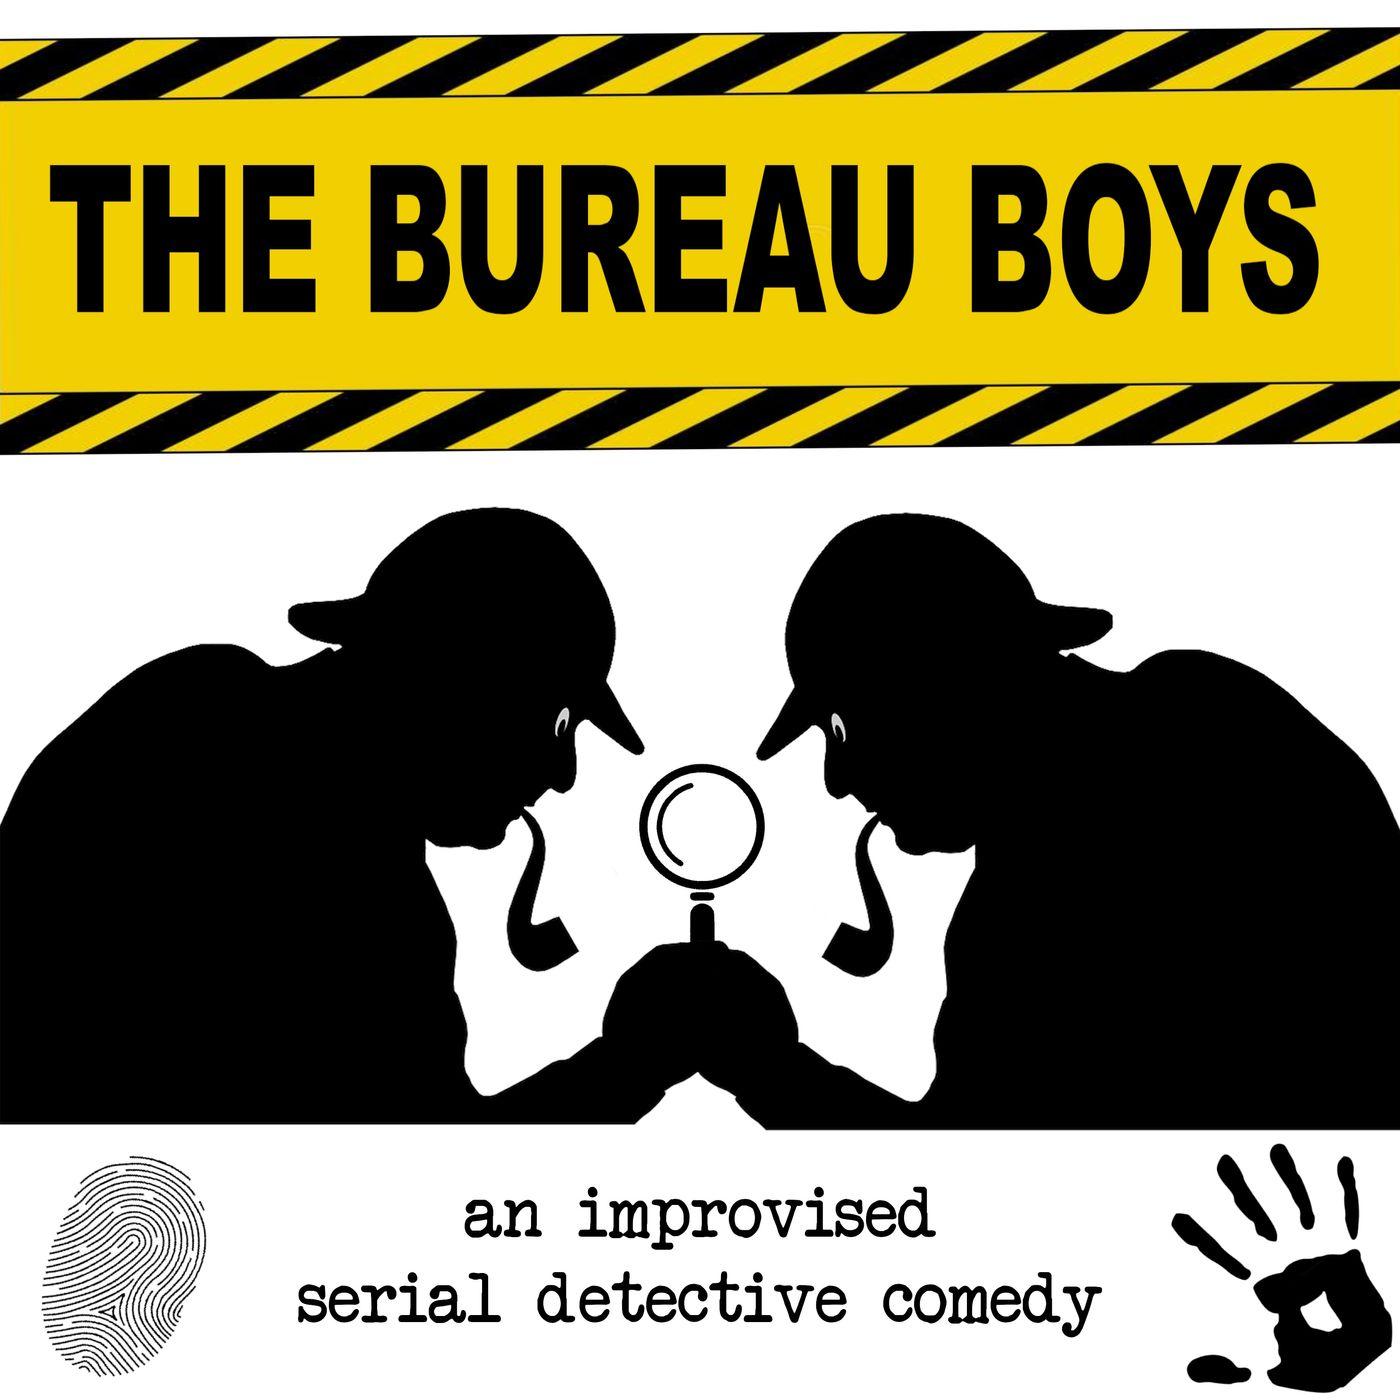 The Case of the Mondays by The Bureau Boys